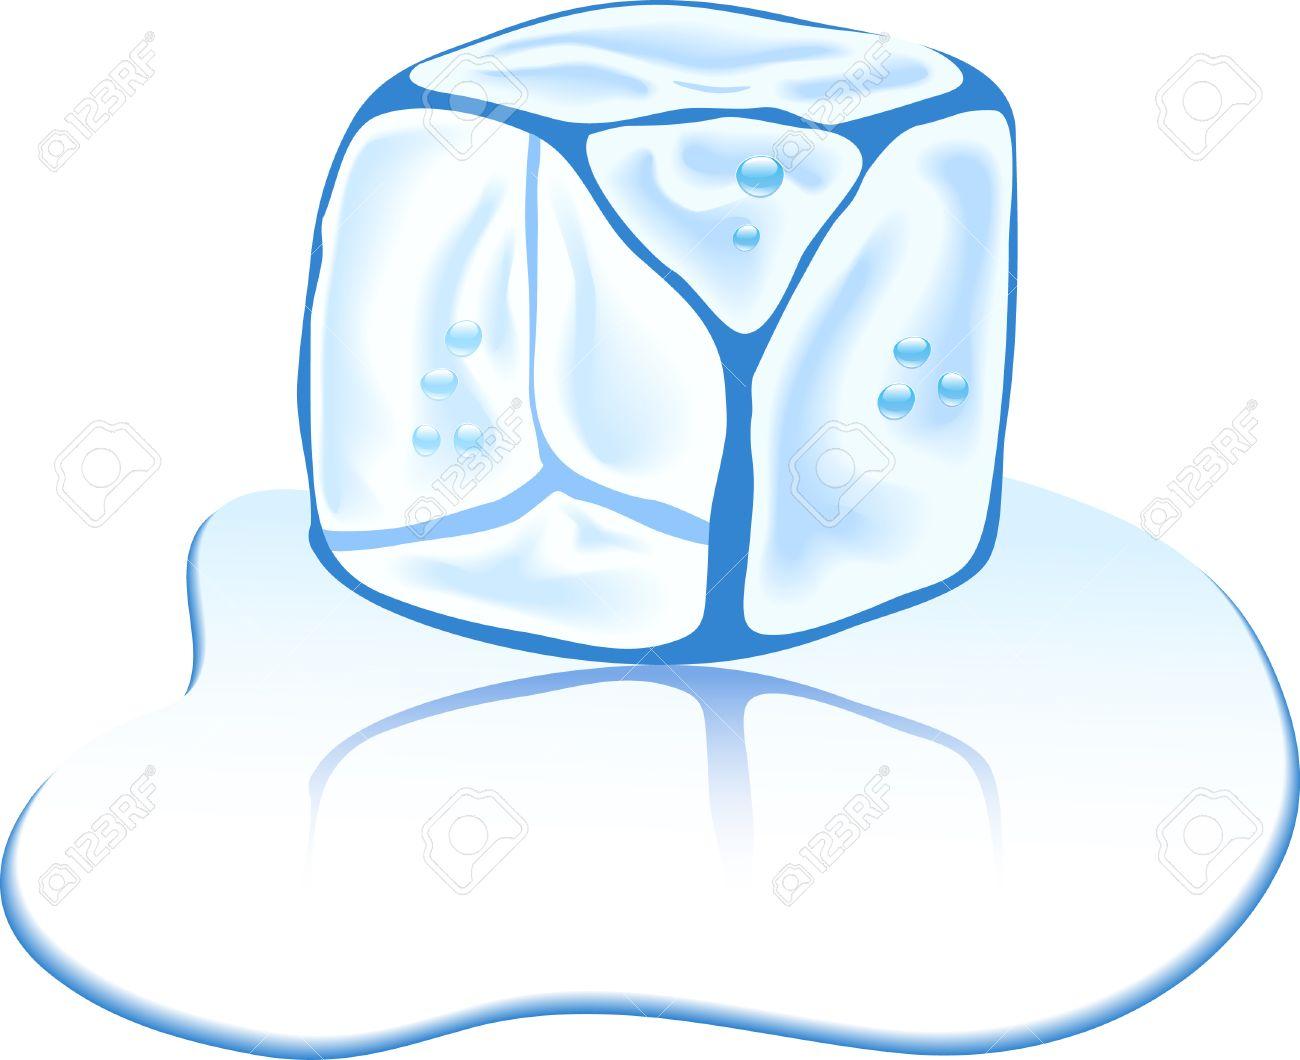 shiny ice cube vector illustration royalty free cliparts vectors rh 123rf com ice cube vector free ice cube vector art